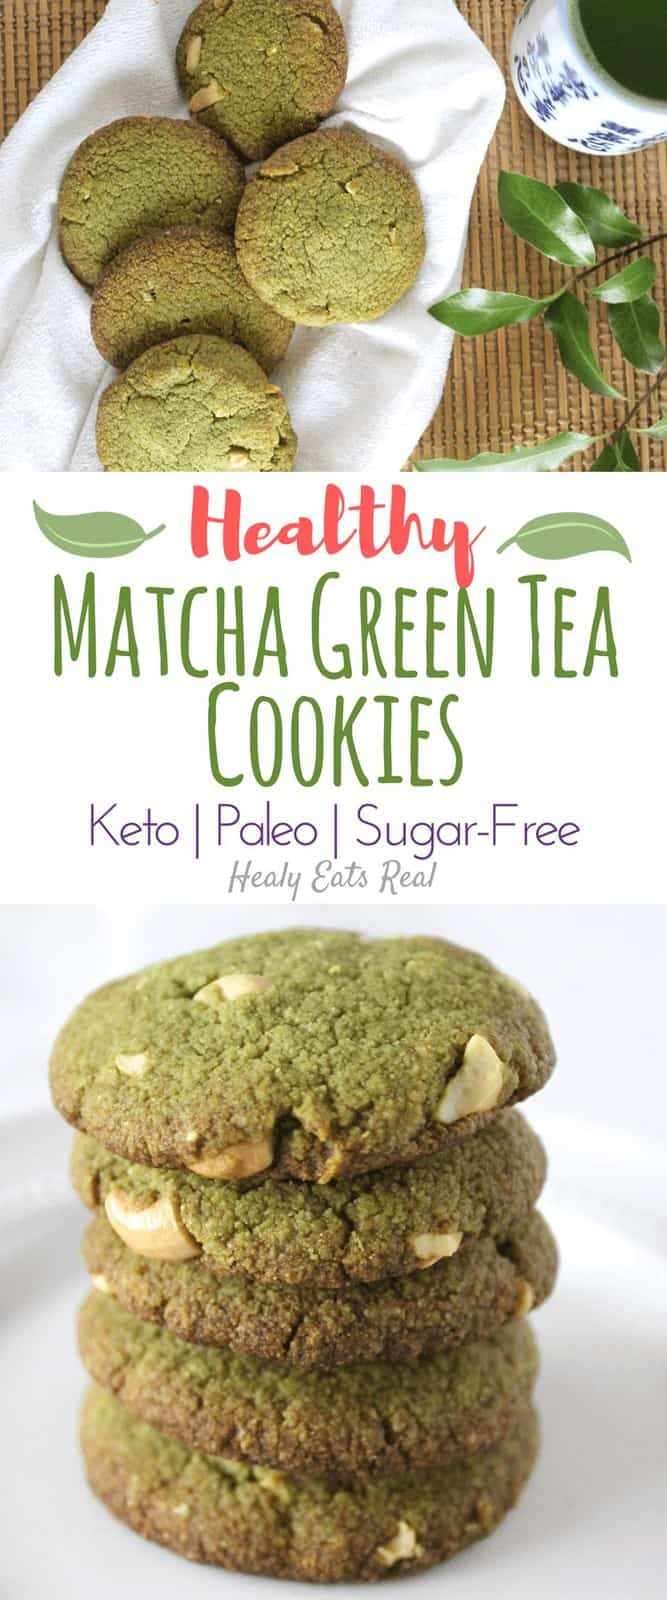 Healthy Matcha Cookies (Keto, Paleo & Sugar Free) - These healthy matcha cookies are such an easy simple treat! They are keto and gluten free and taste a bit like almond flour shortbread with a green tea kick. #matcha #cookies #paleo #dessert #healyeatsreal